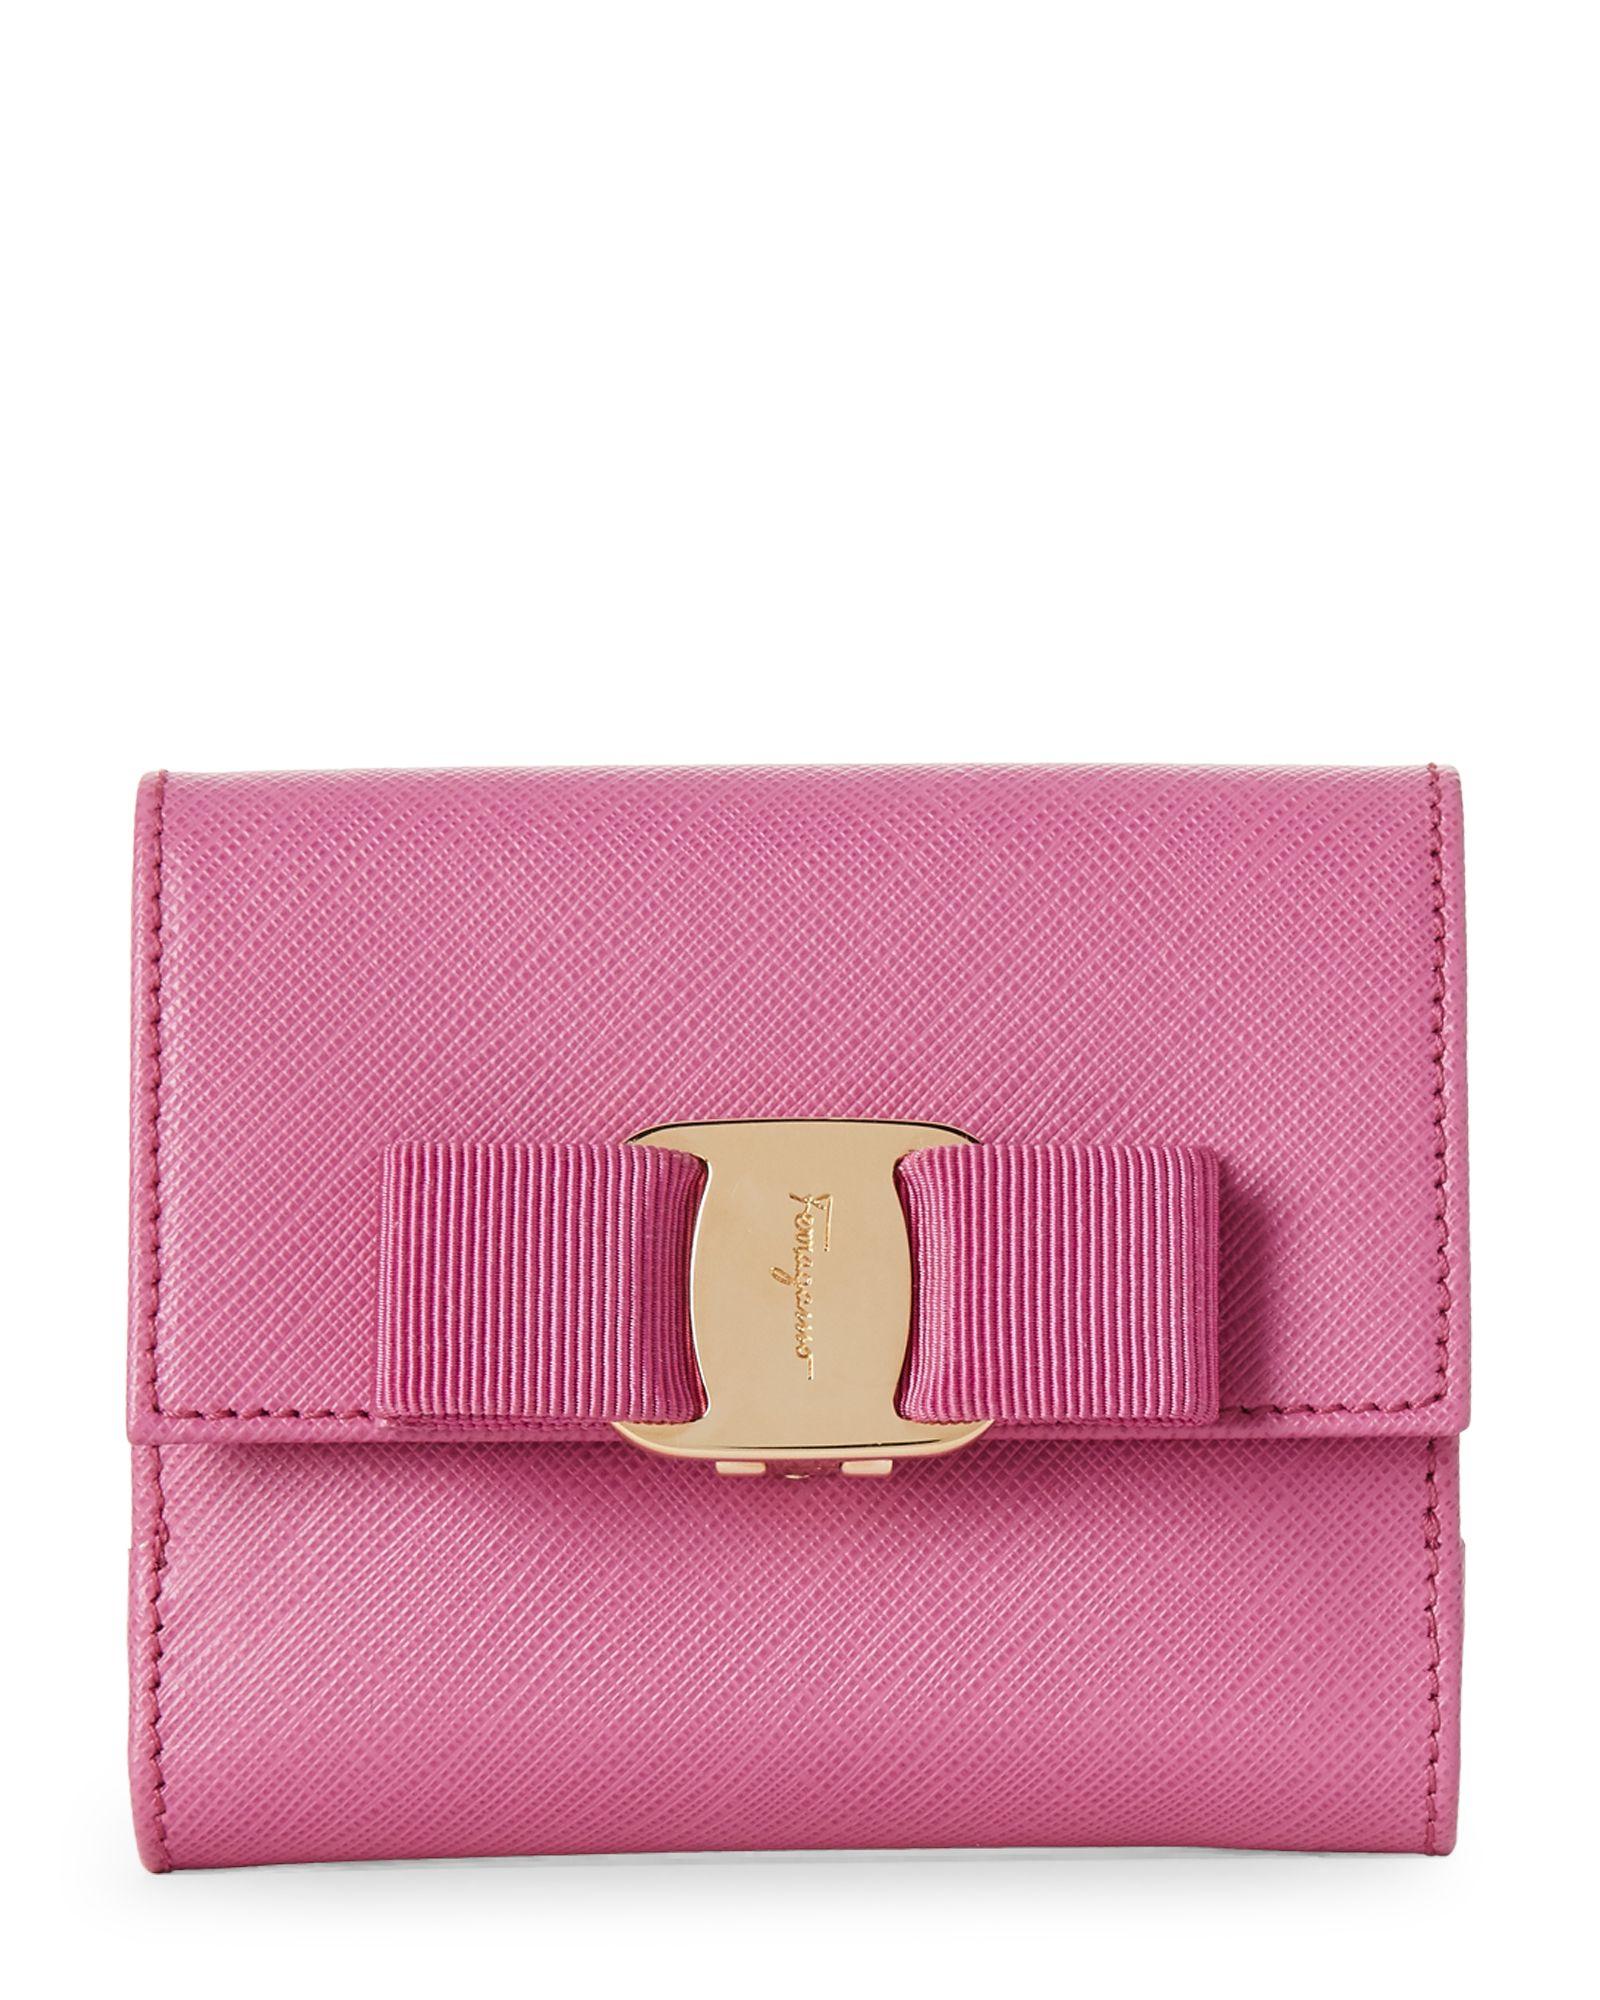 615b46ecfc Salvatore Ferragamo Pink Vara Saffiano French Wallet